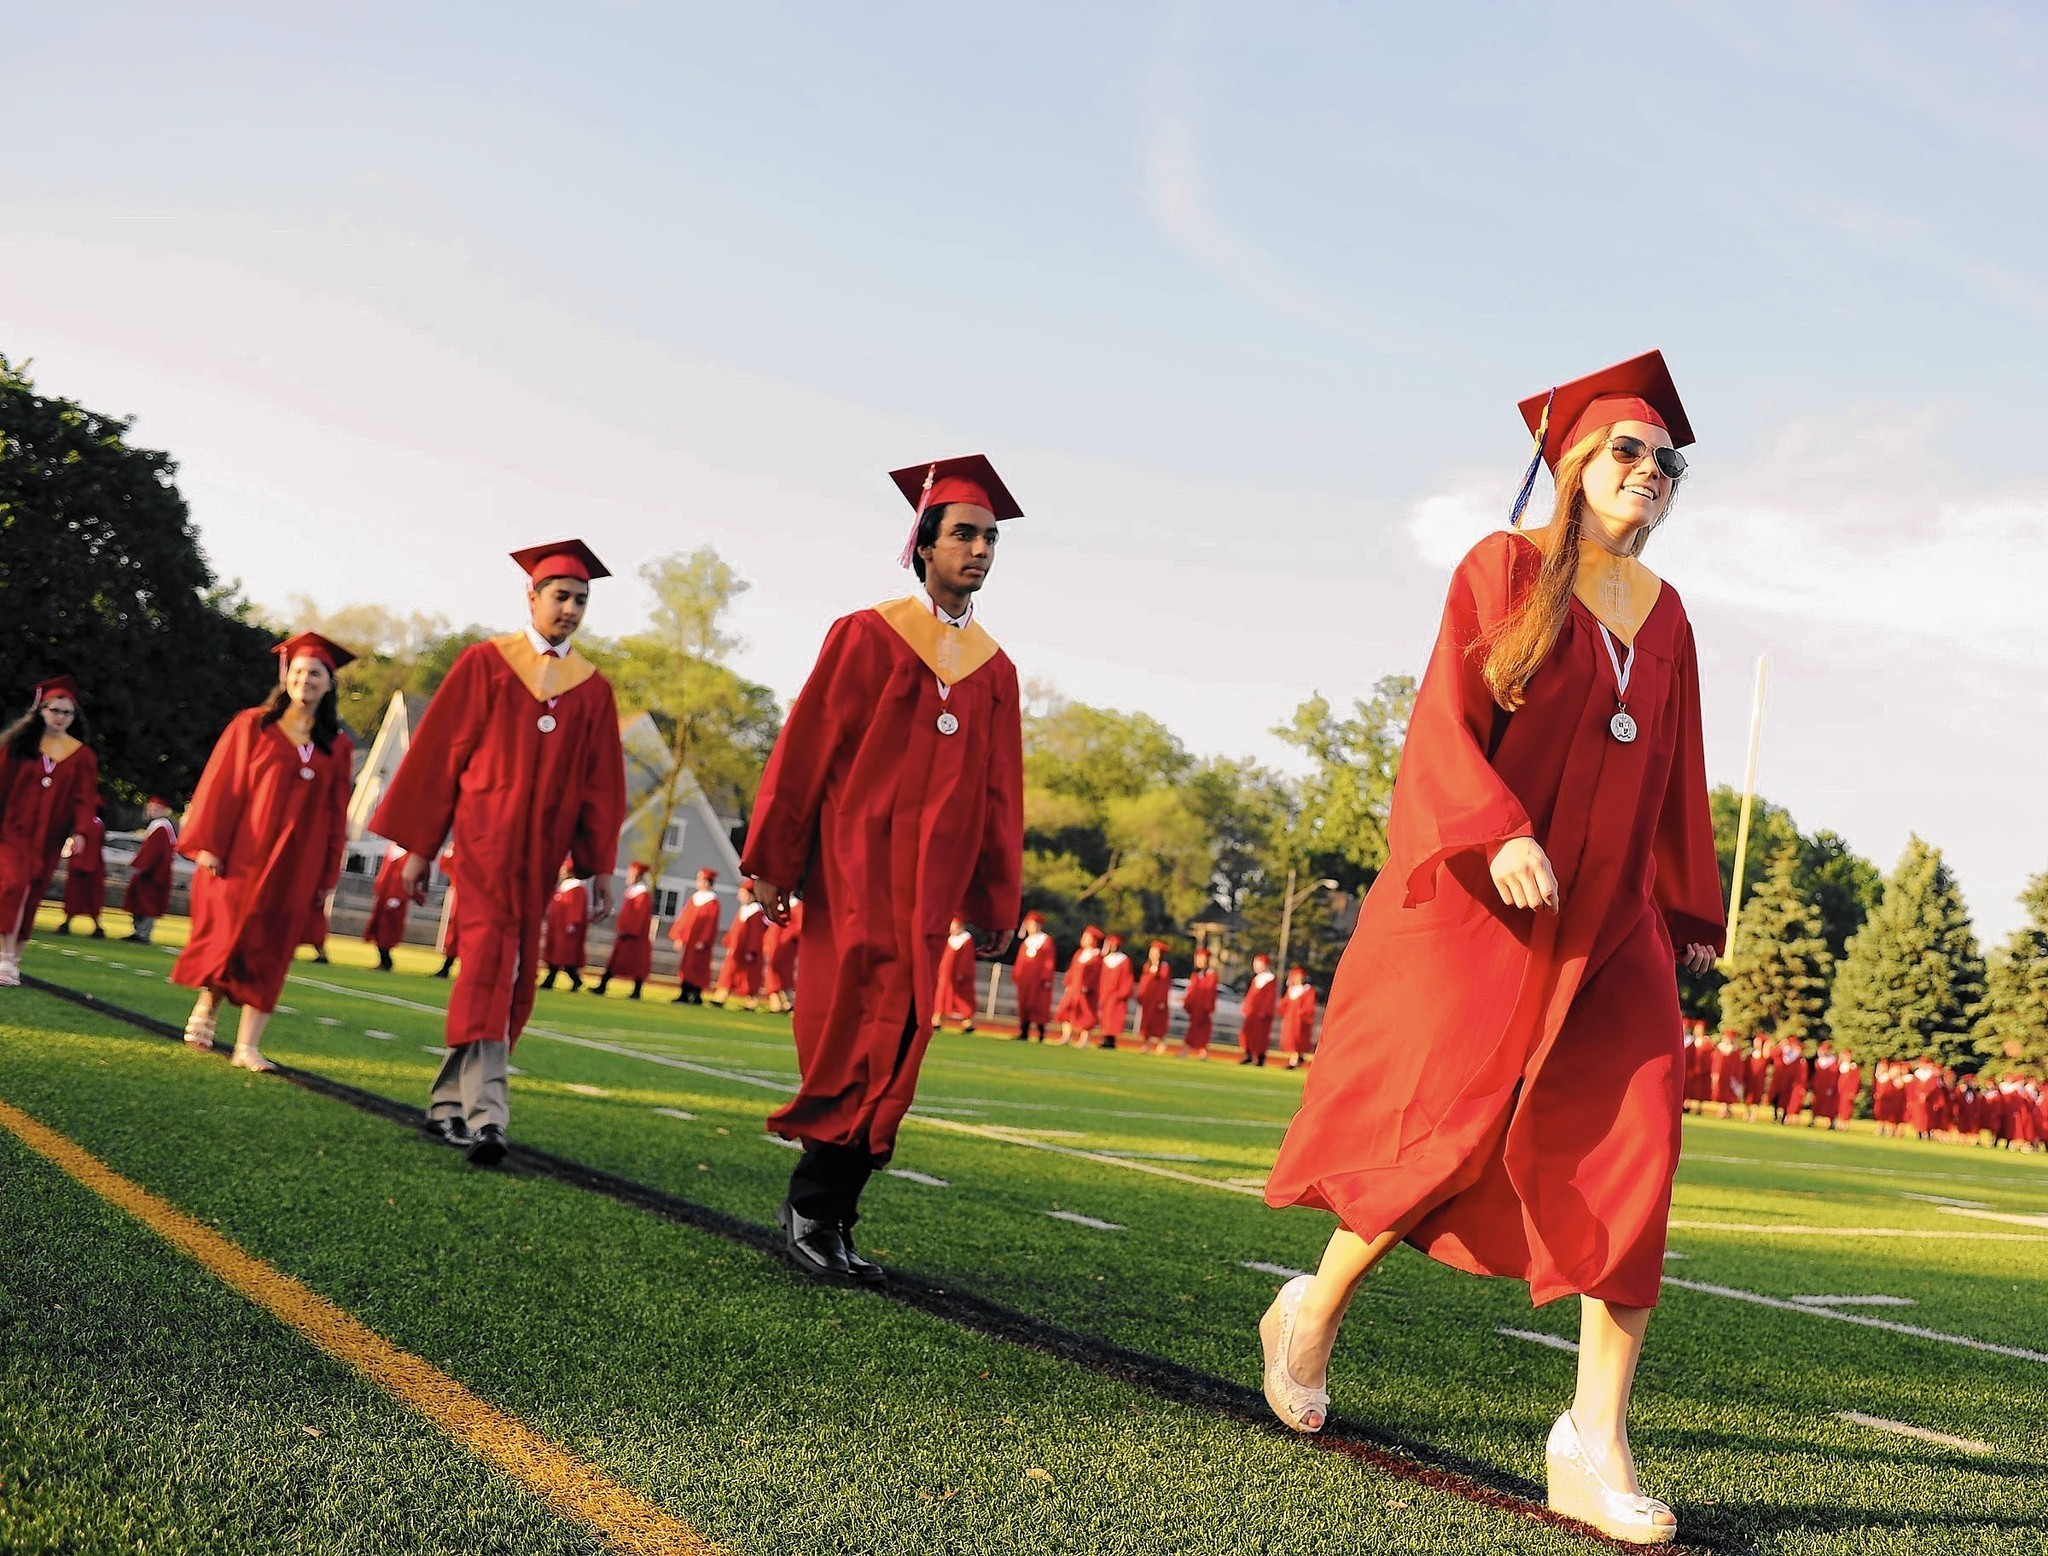 Photos: Hinsdale Central 2015 graduation - The Doings Hinsdale